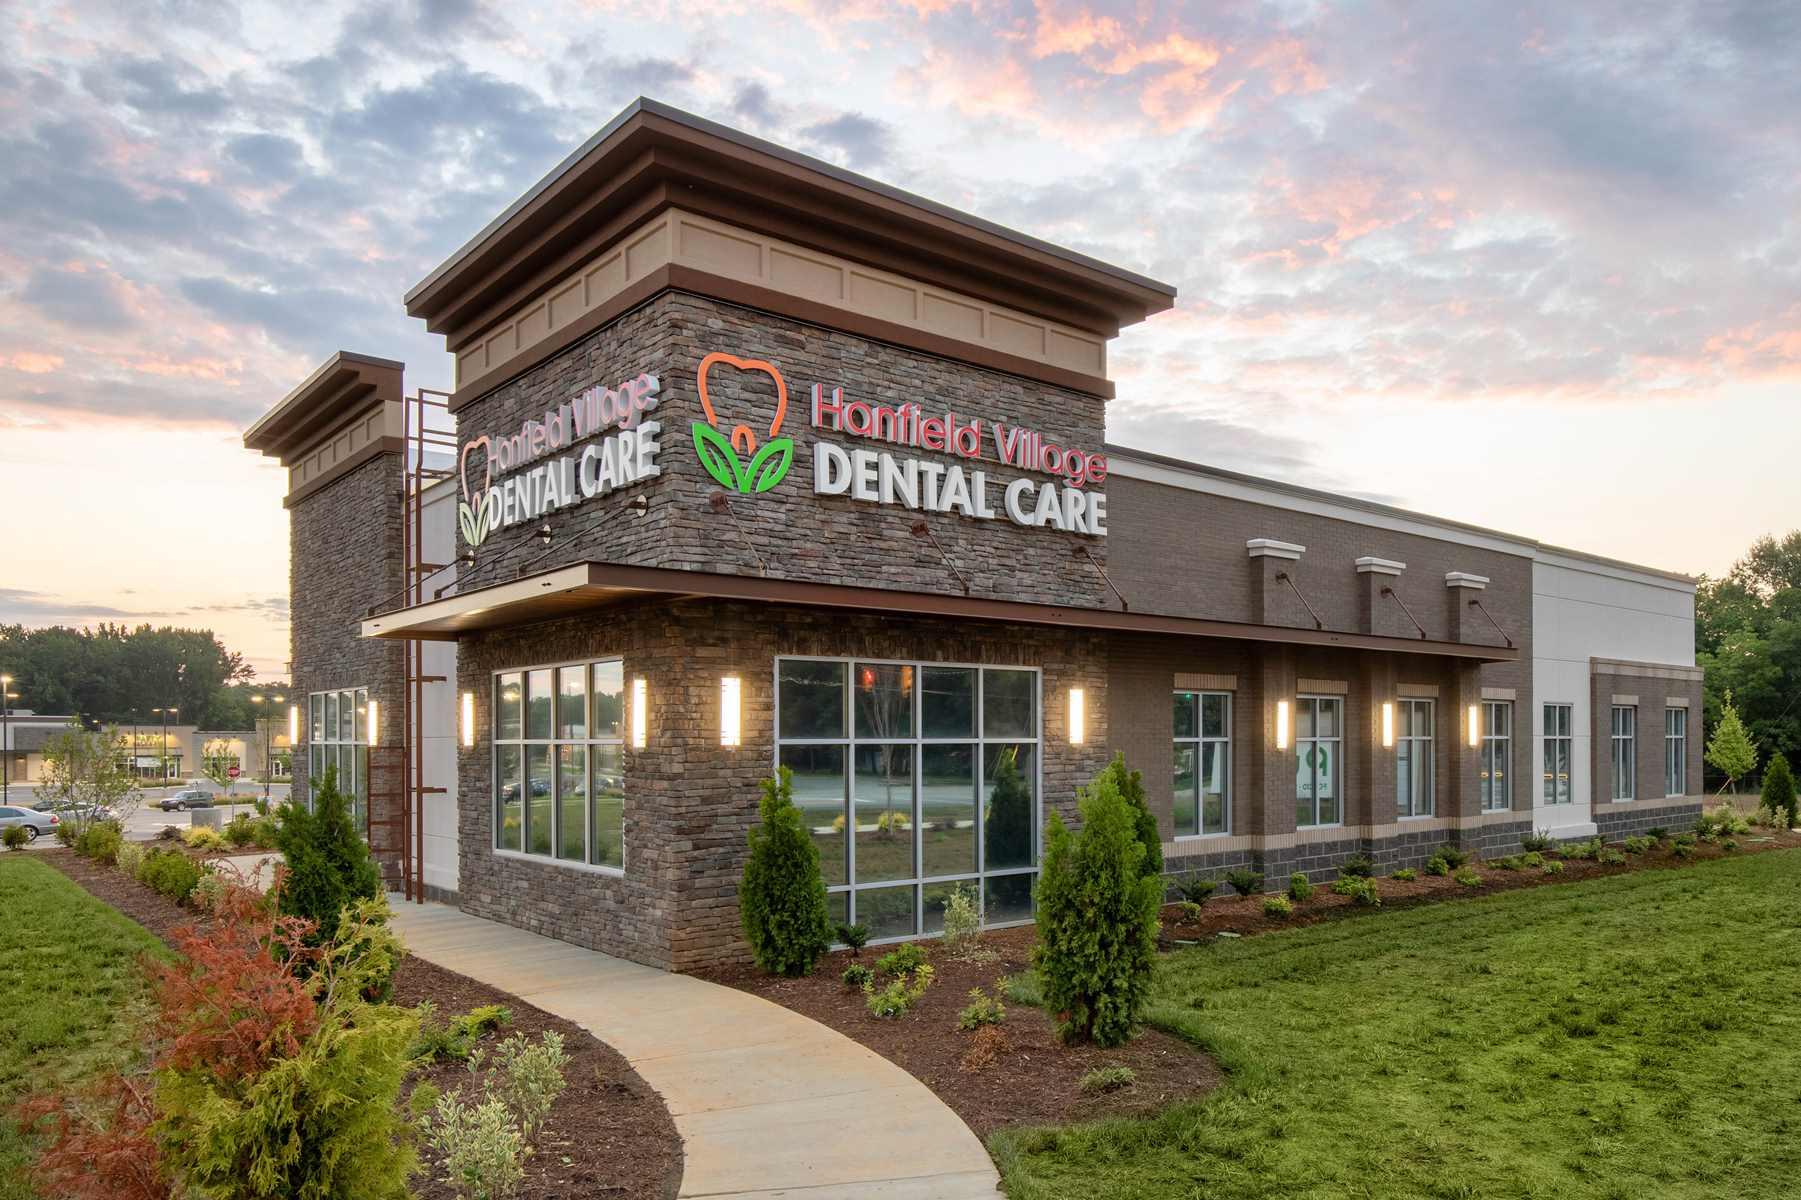 Hanfield Village Dental Care Exterior